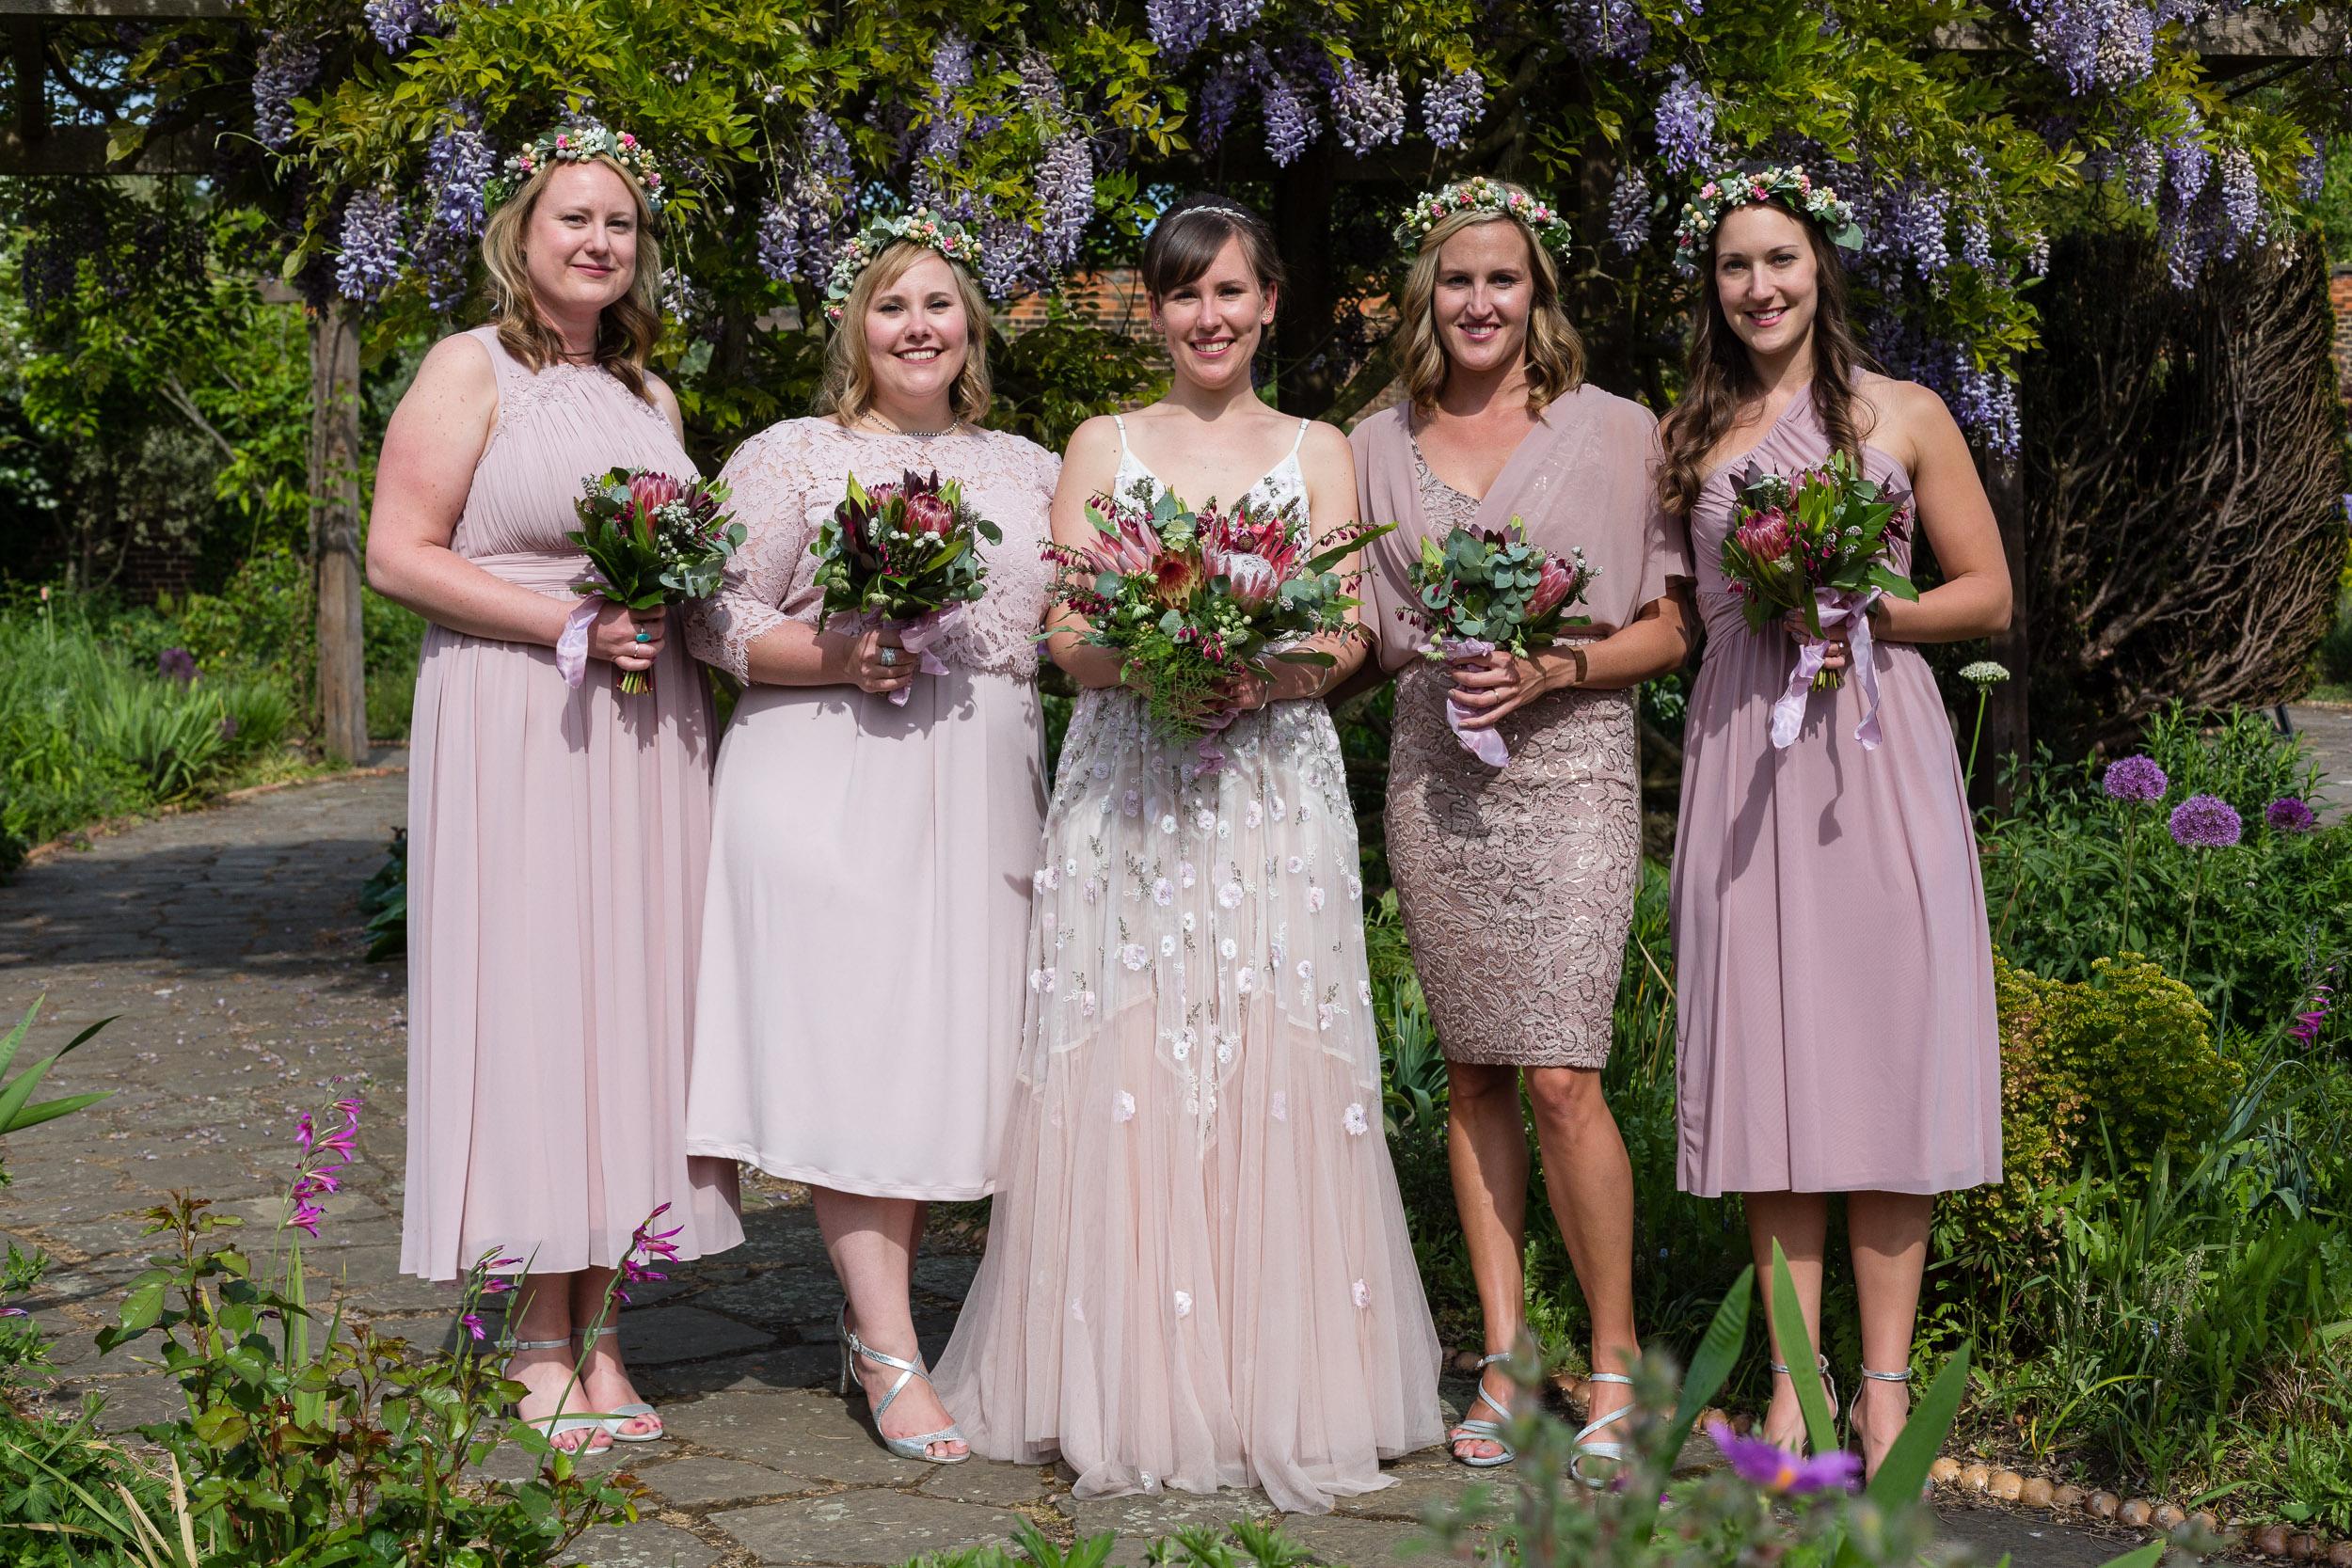 brockwell-lido-brixton-herne-hill-wedding-263.jpg